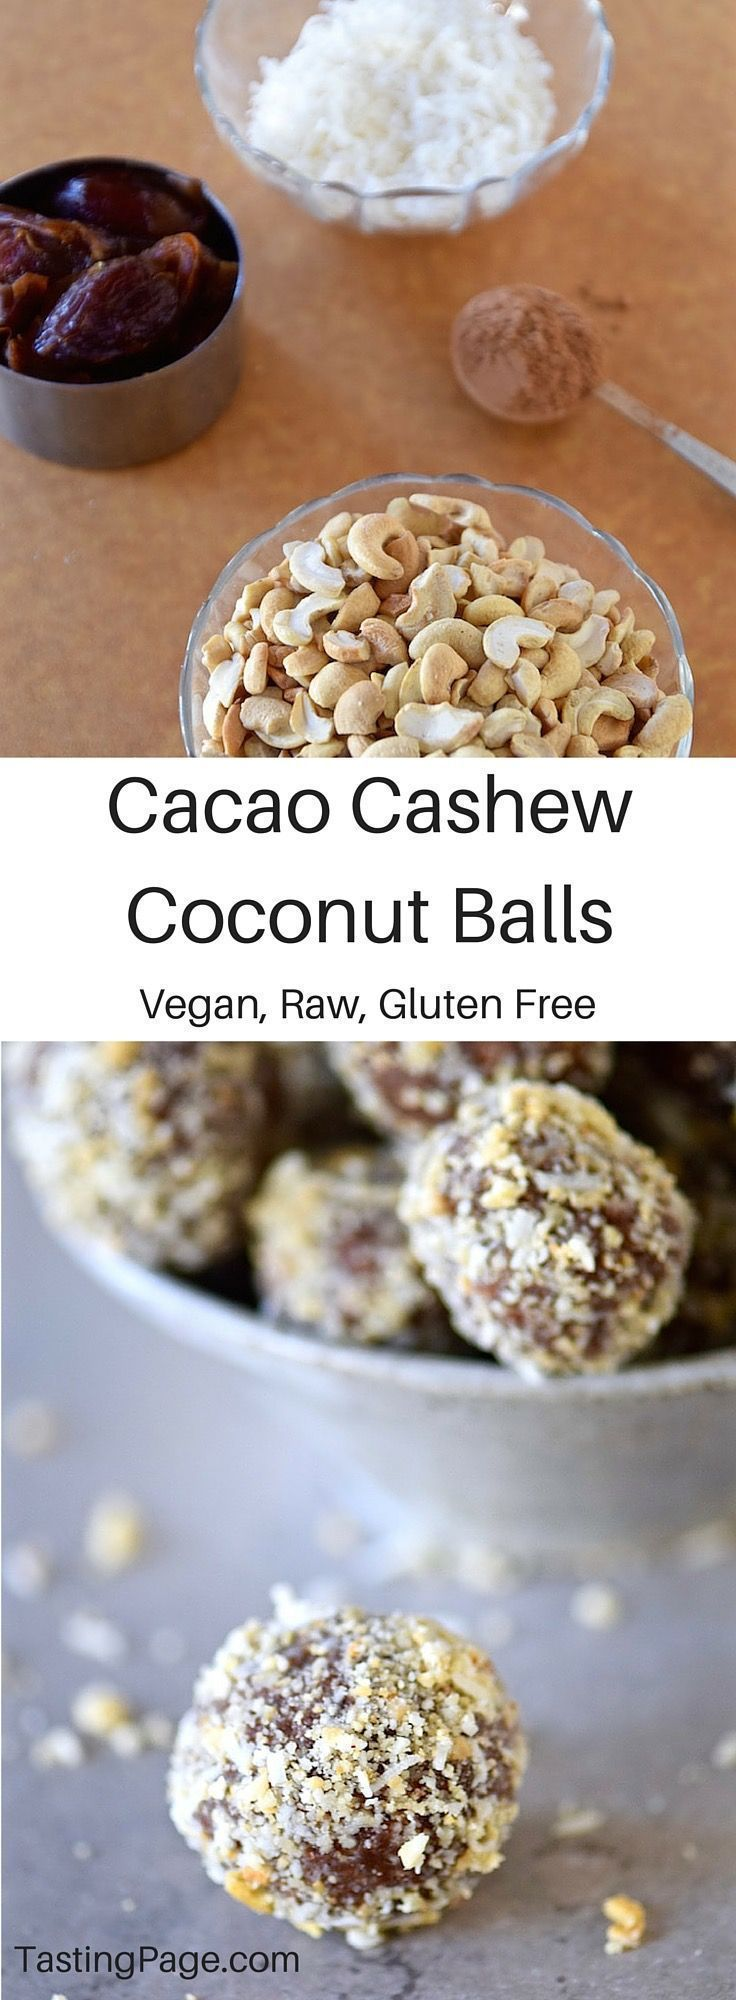 ... on Pinterest | Healthy vegan snacks, Vegan chili recipes and Spaghetti